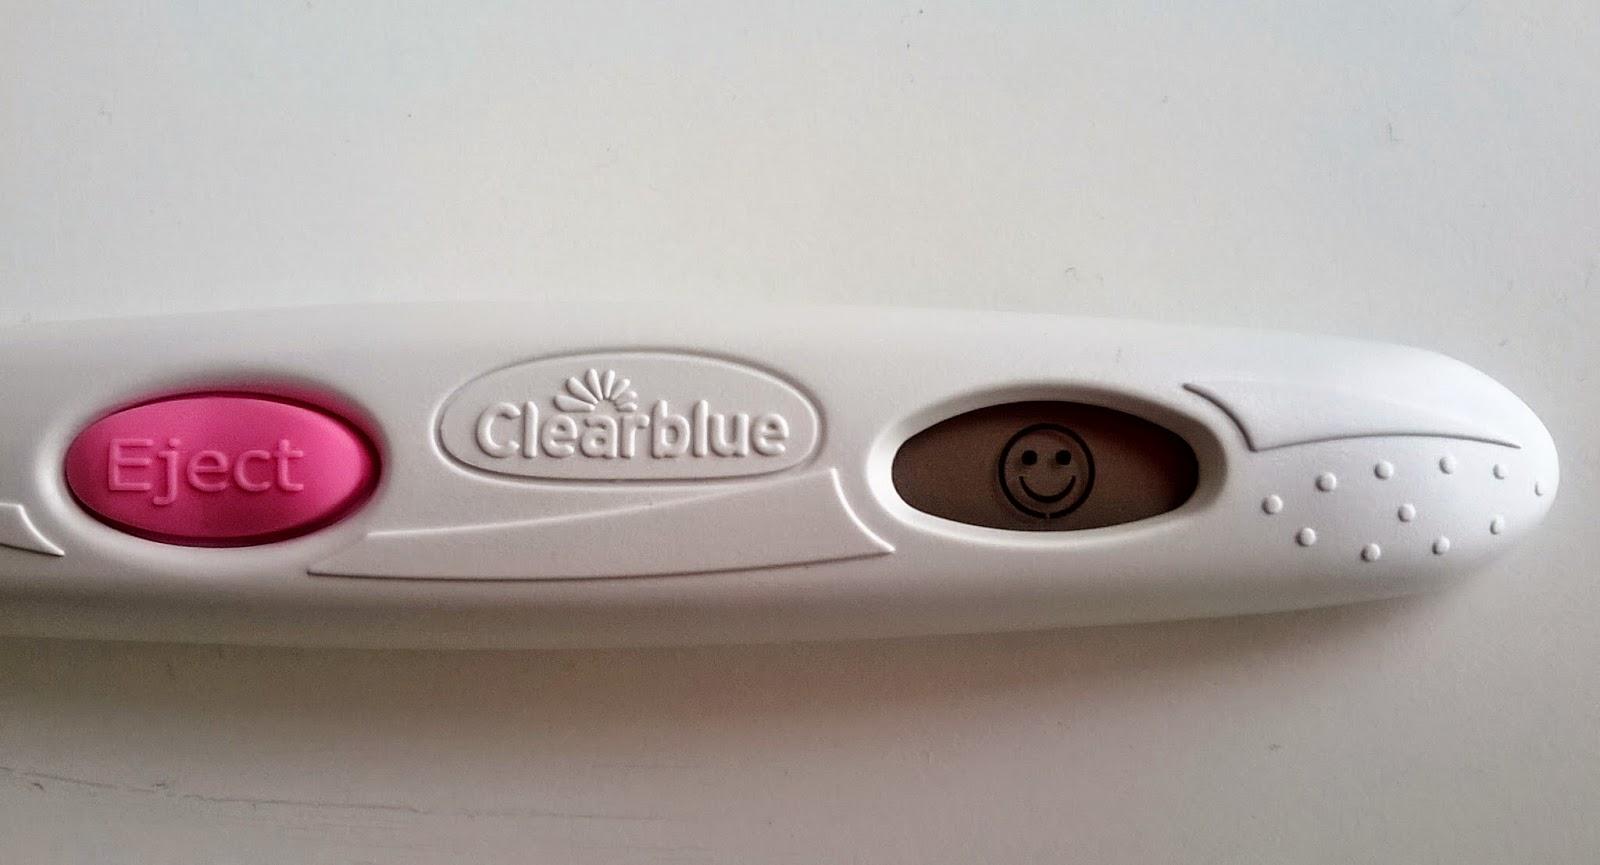 raskaus ruskea vuoto pitkä orgasmi